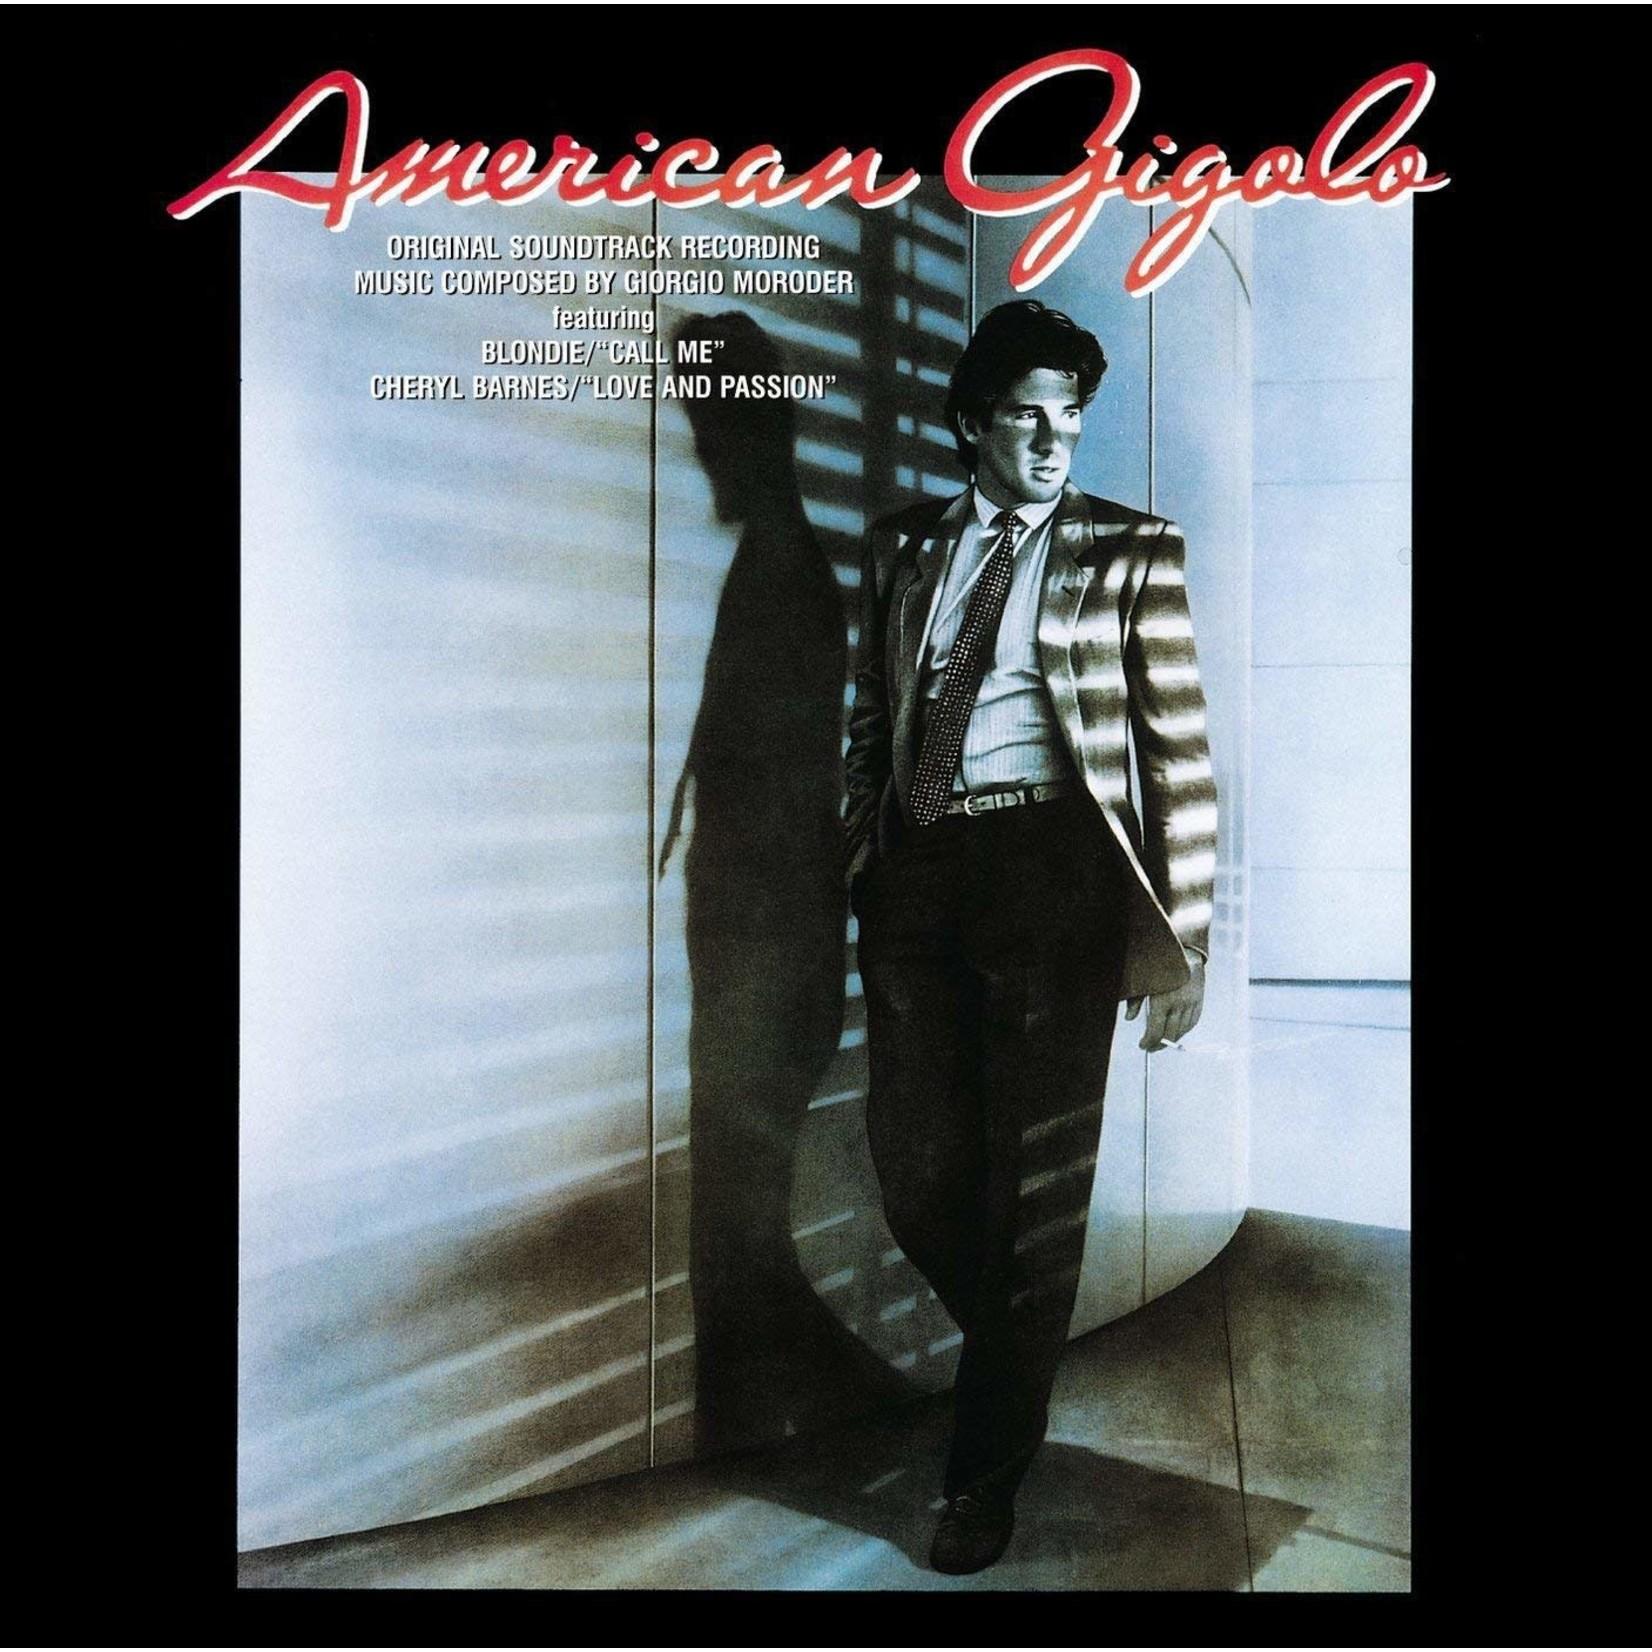 [Vintage] Moroder, Giorgio: American Gigolo (Soundtrack)